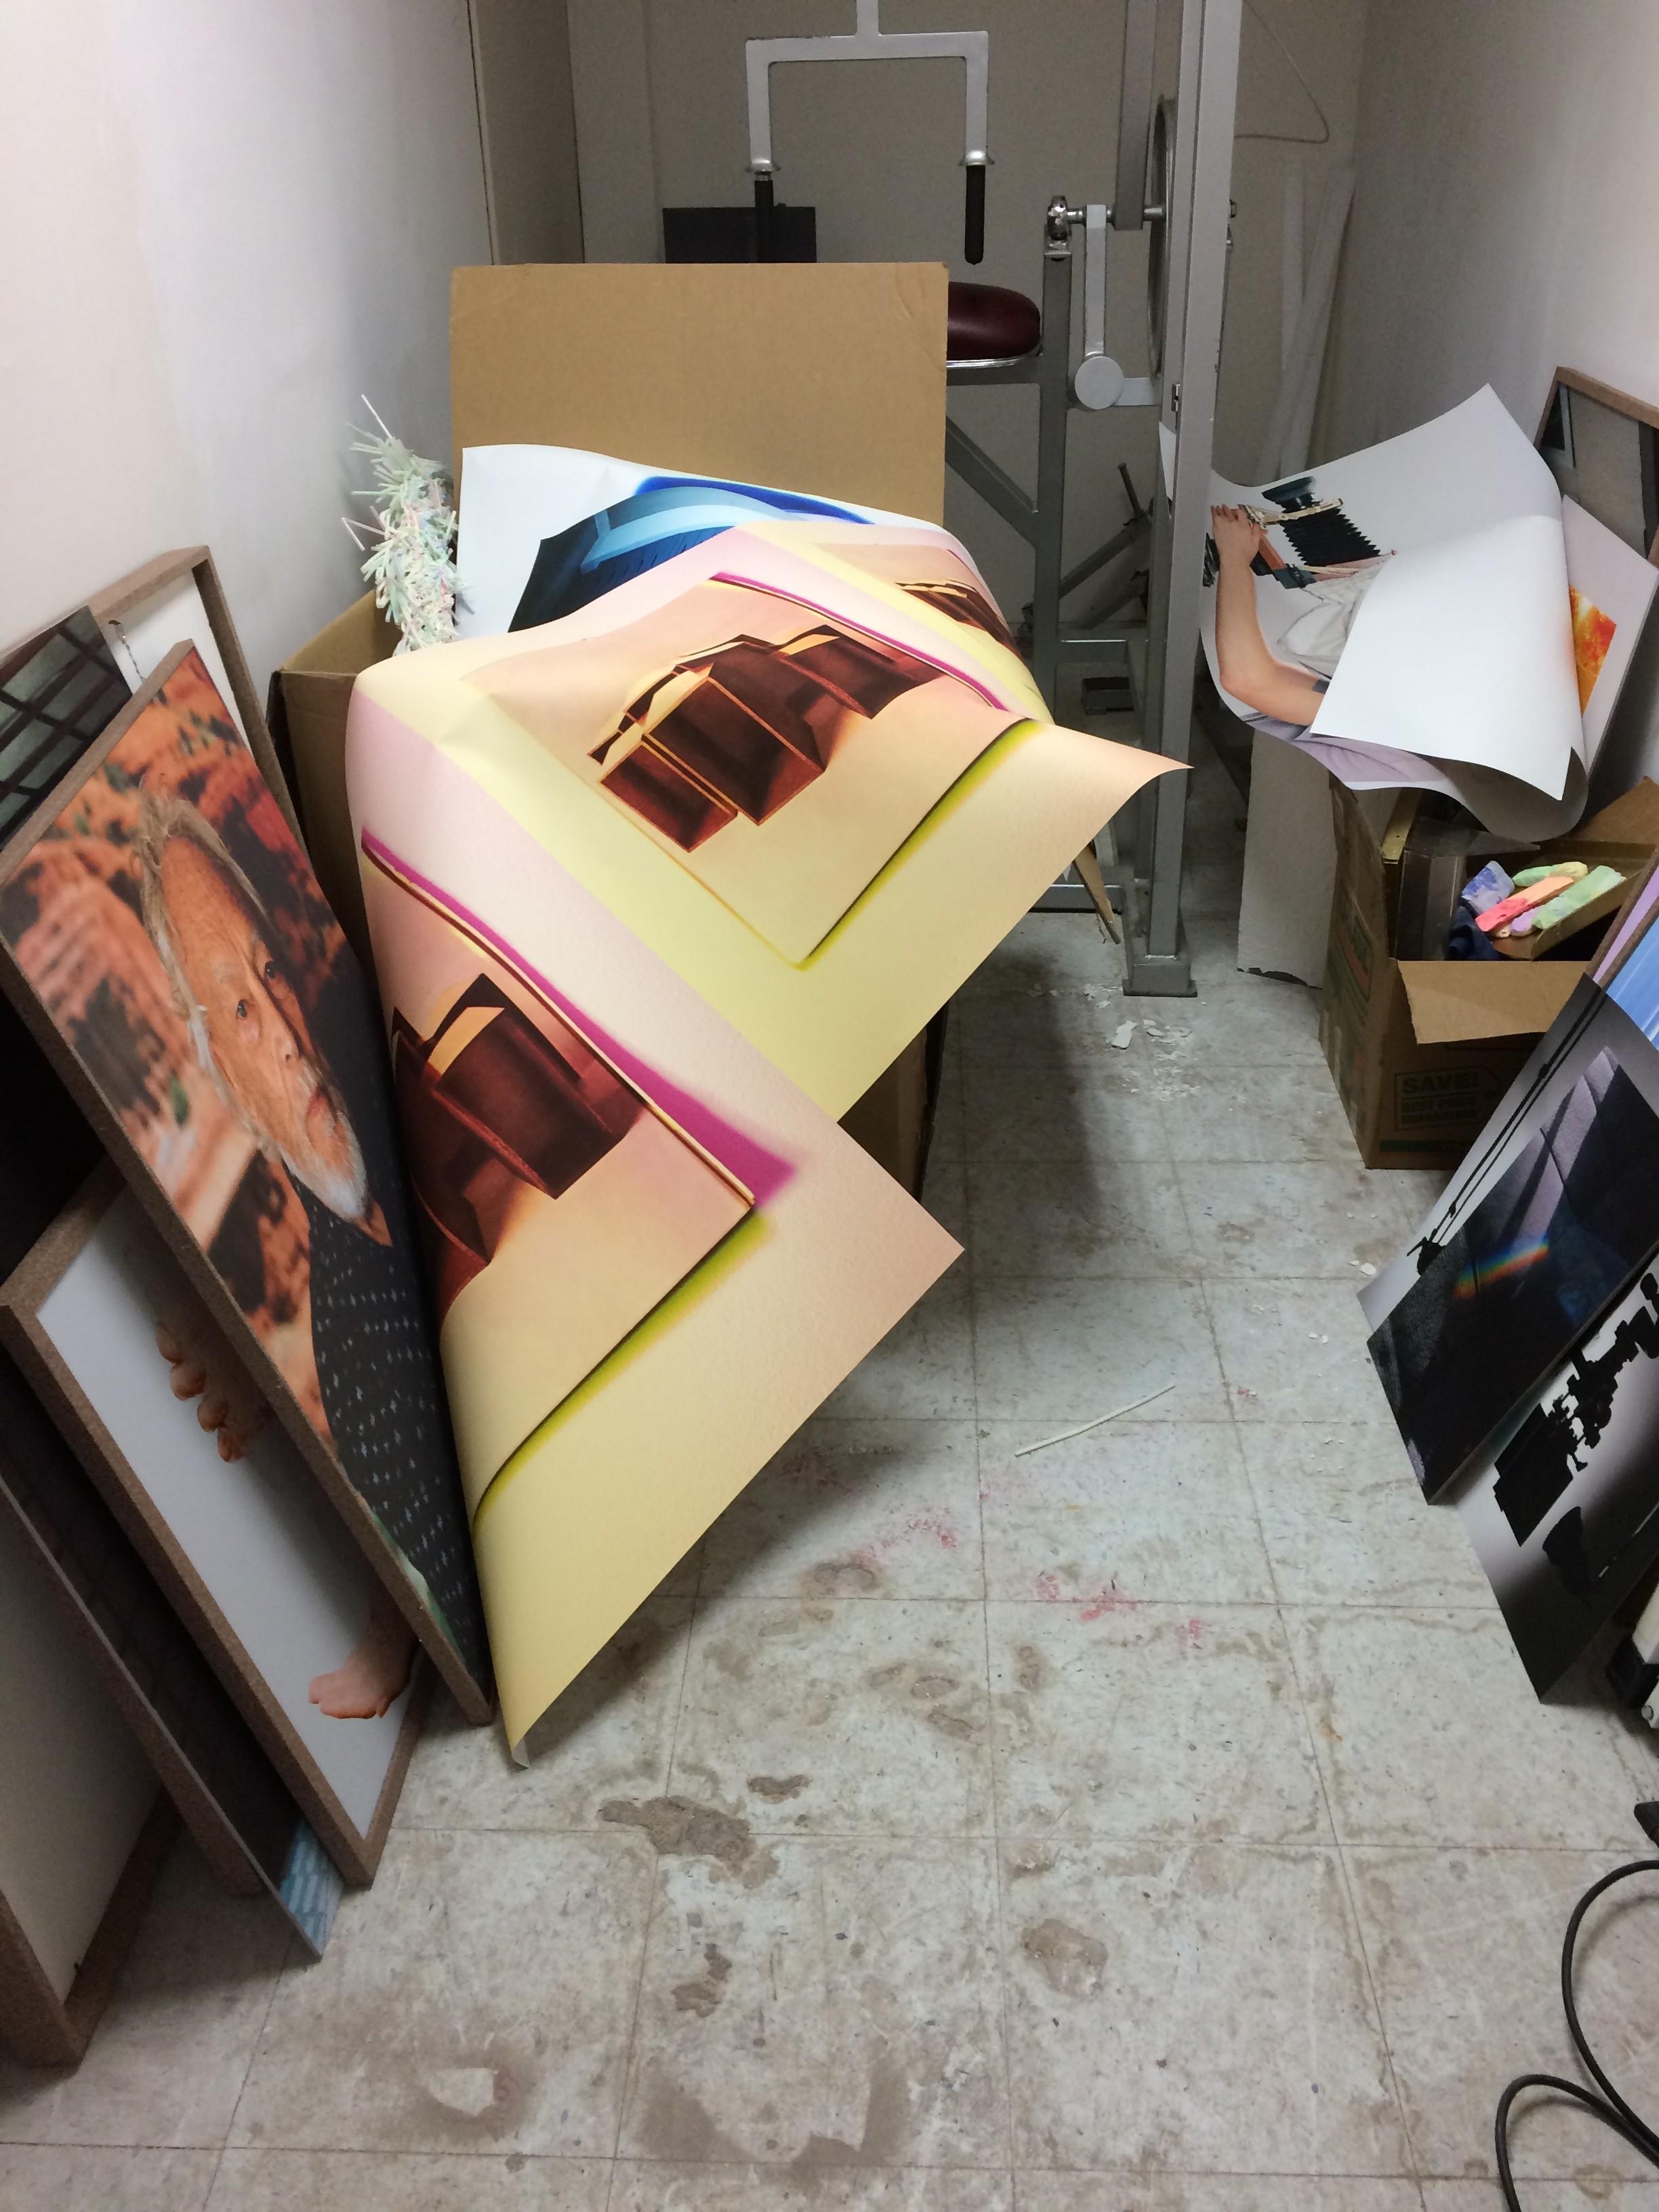 ian james damaged work